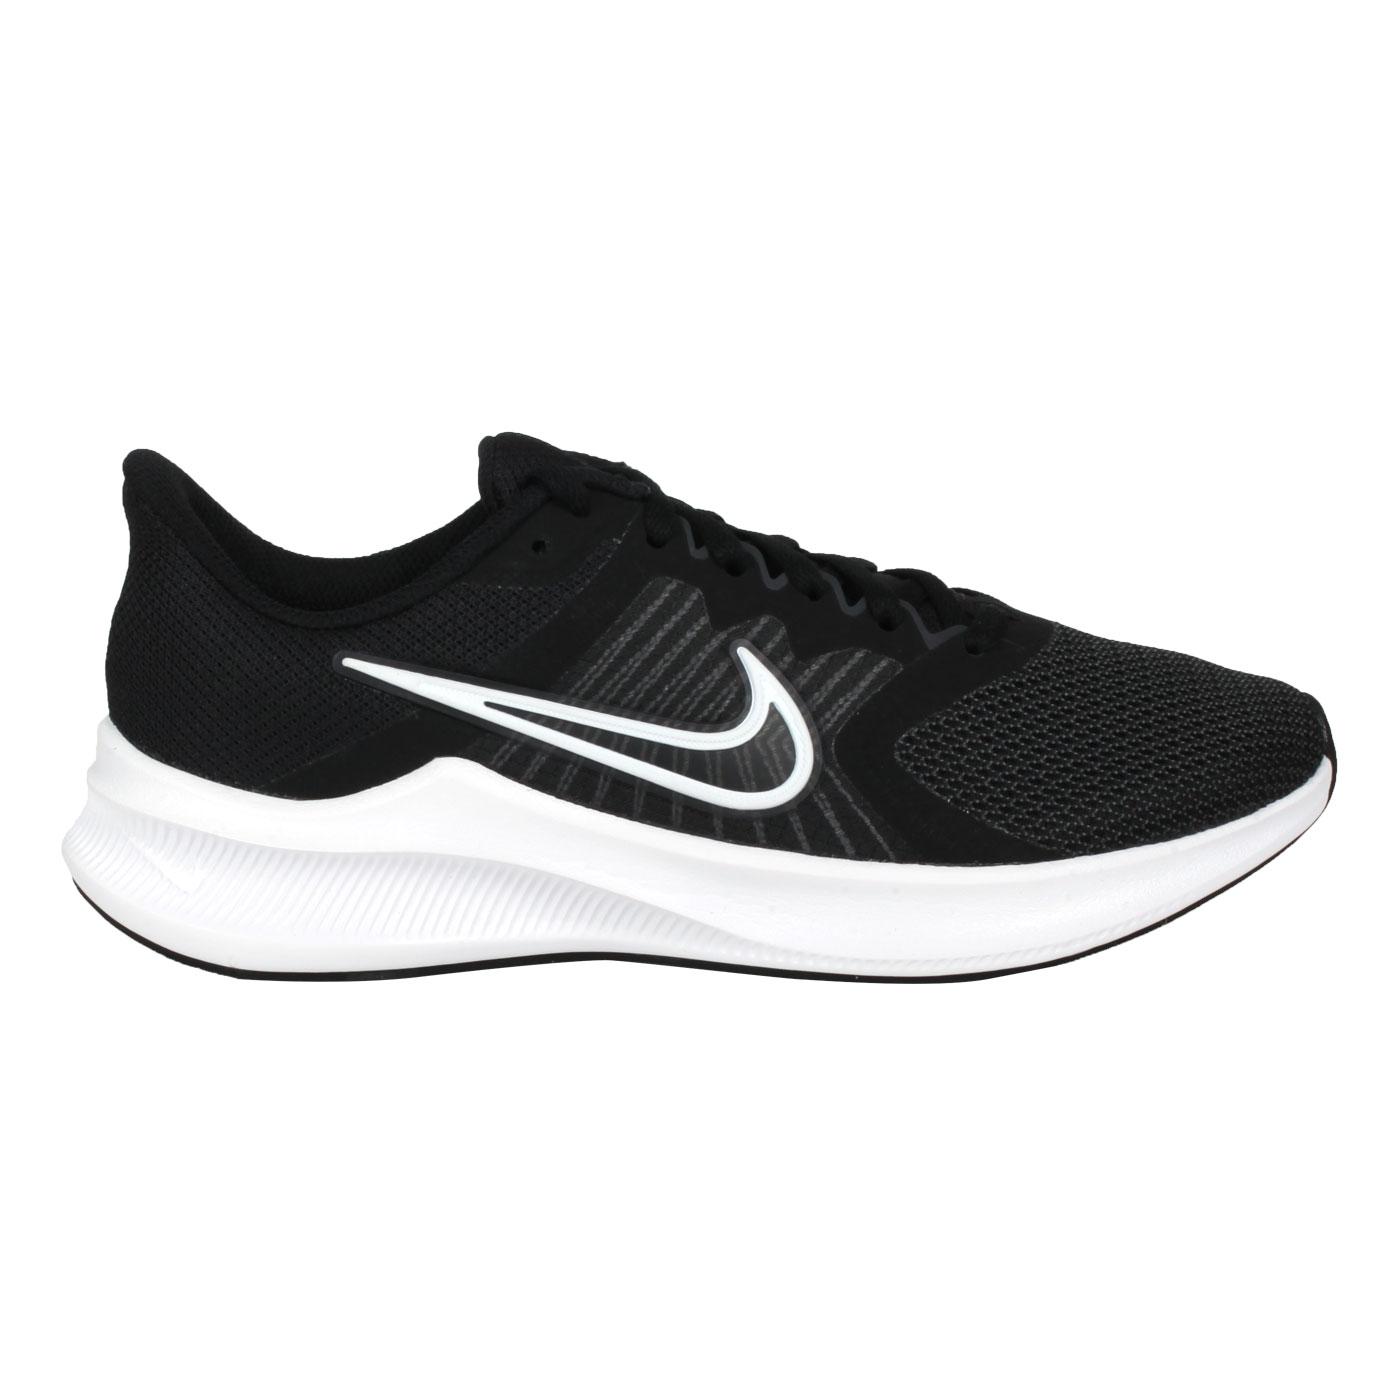 NIKE 男款休閒運動鞋  @ DOWNSHIFTER 11@CW3411006 - 黑白